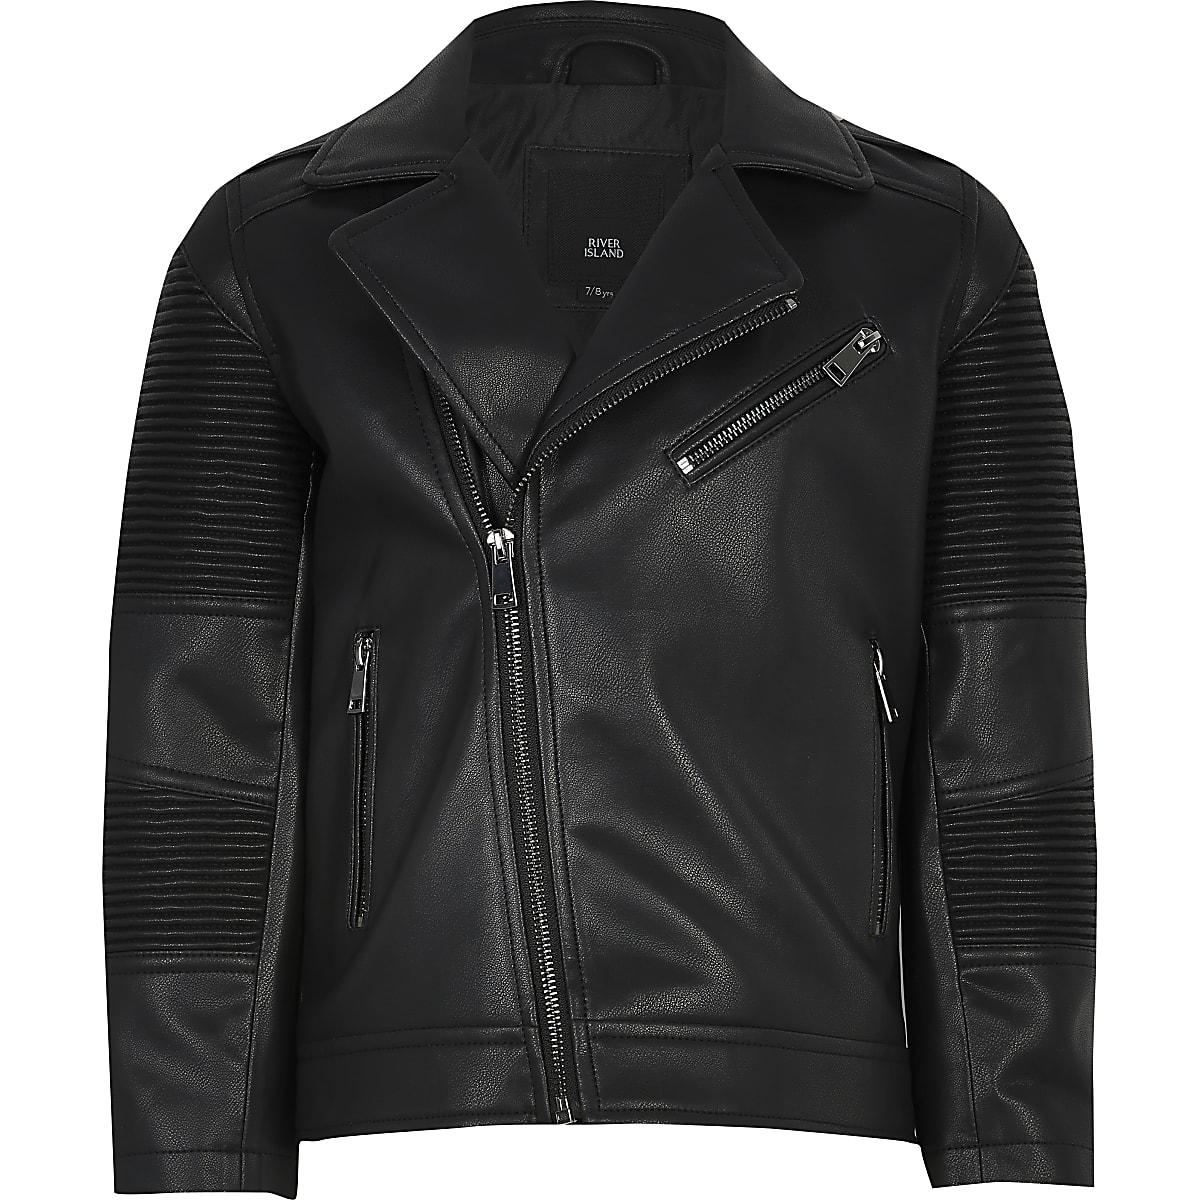 Boys black faux leather ridged biker jacket